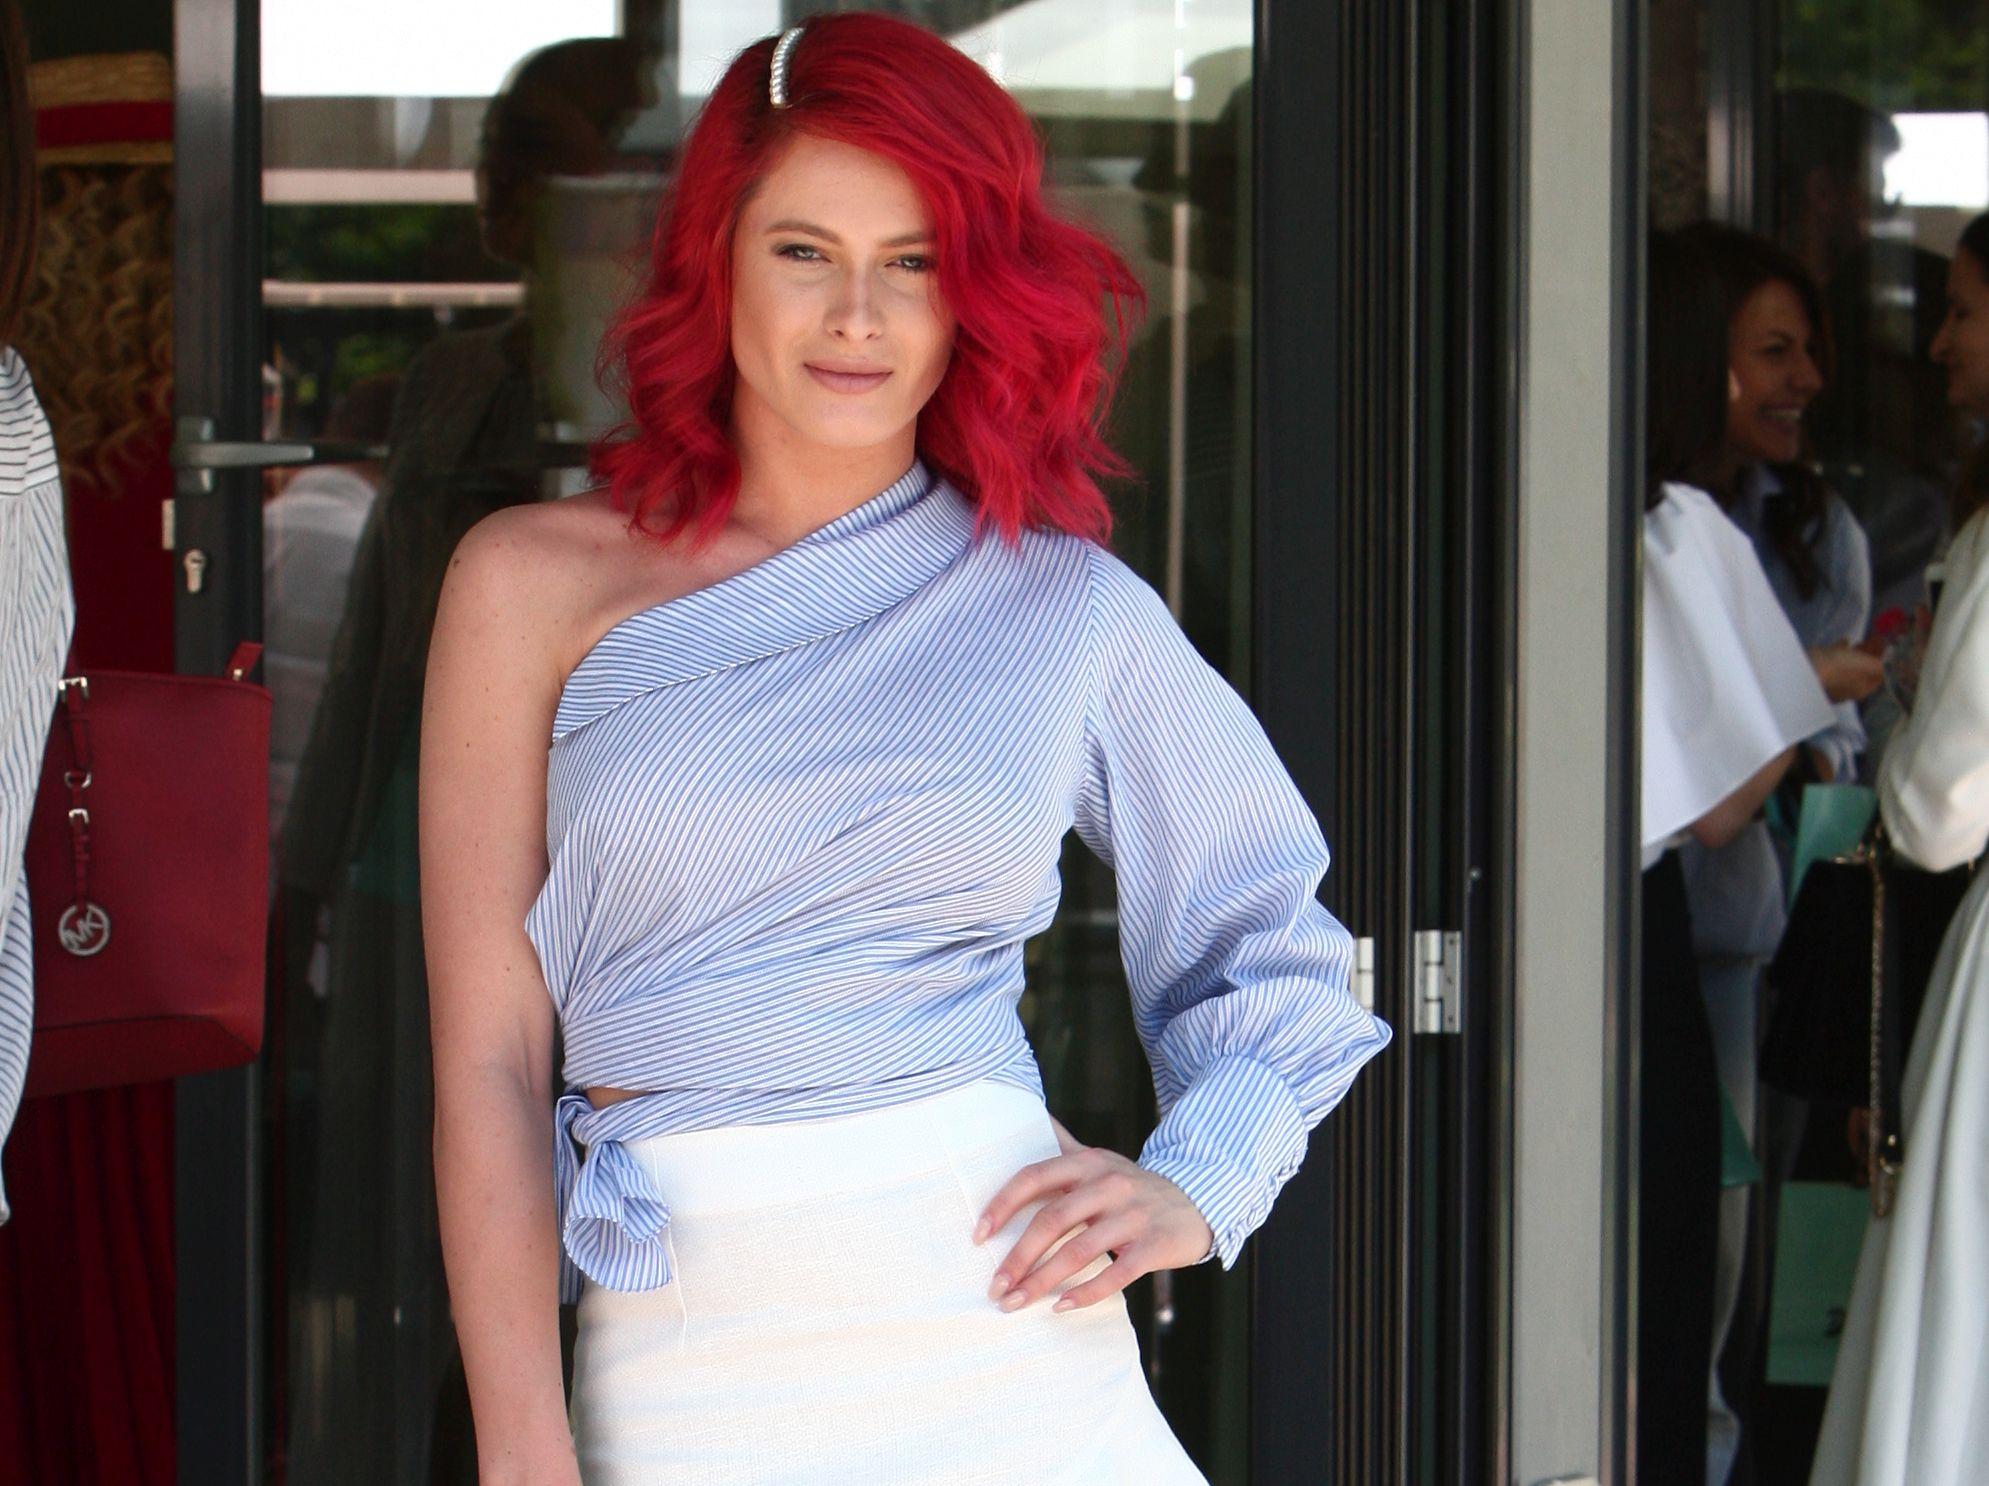 Raluka nu se consideră o fashion victim